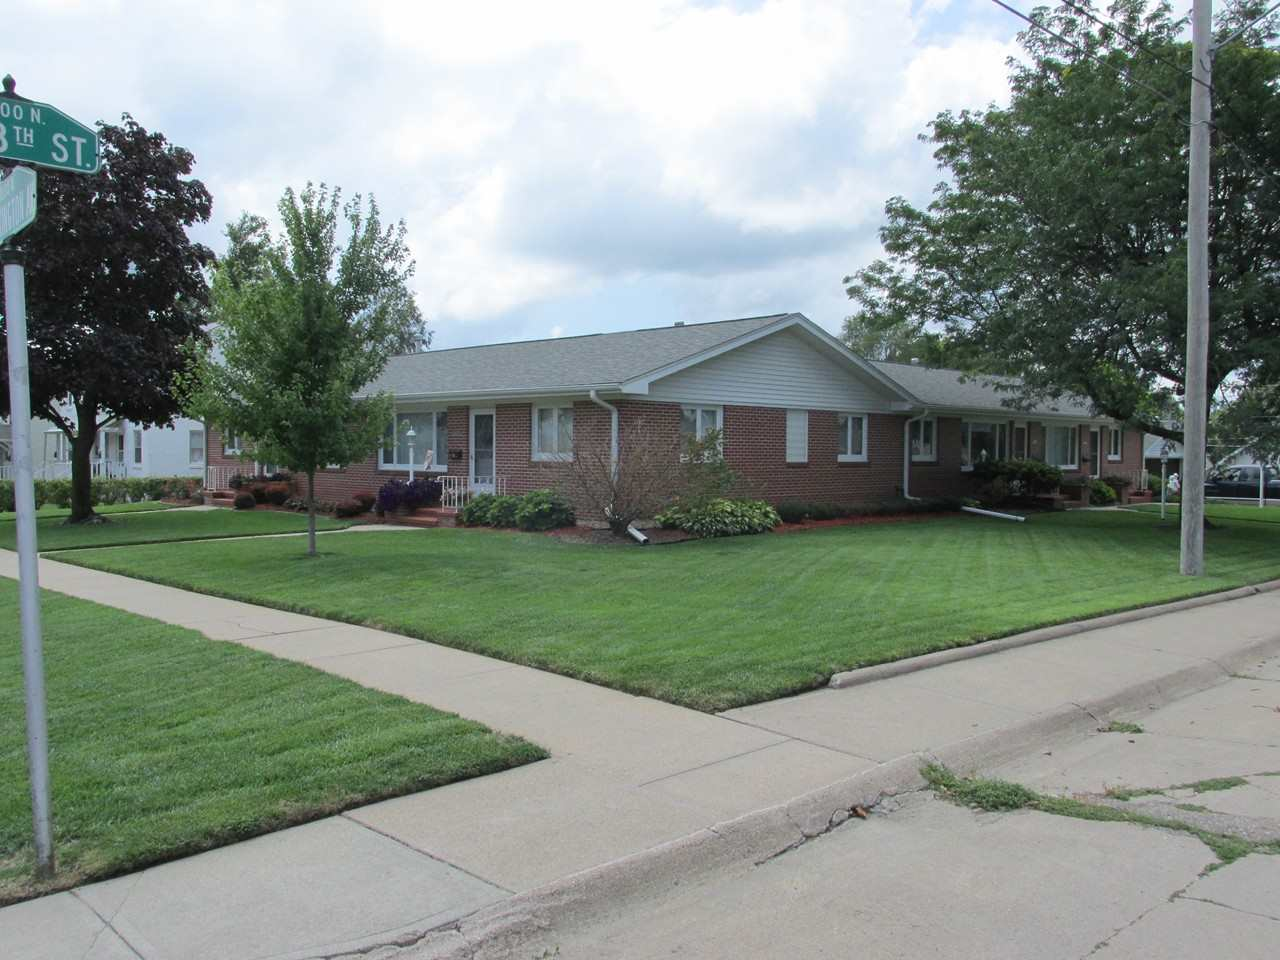 Real Estate for Sale, ListingId: 34752355, Hastings,NE68901